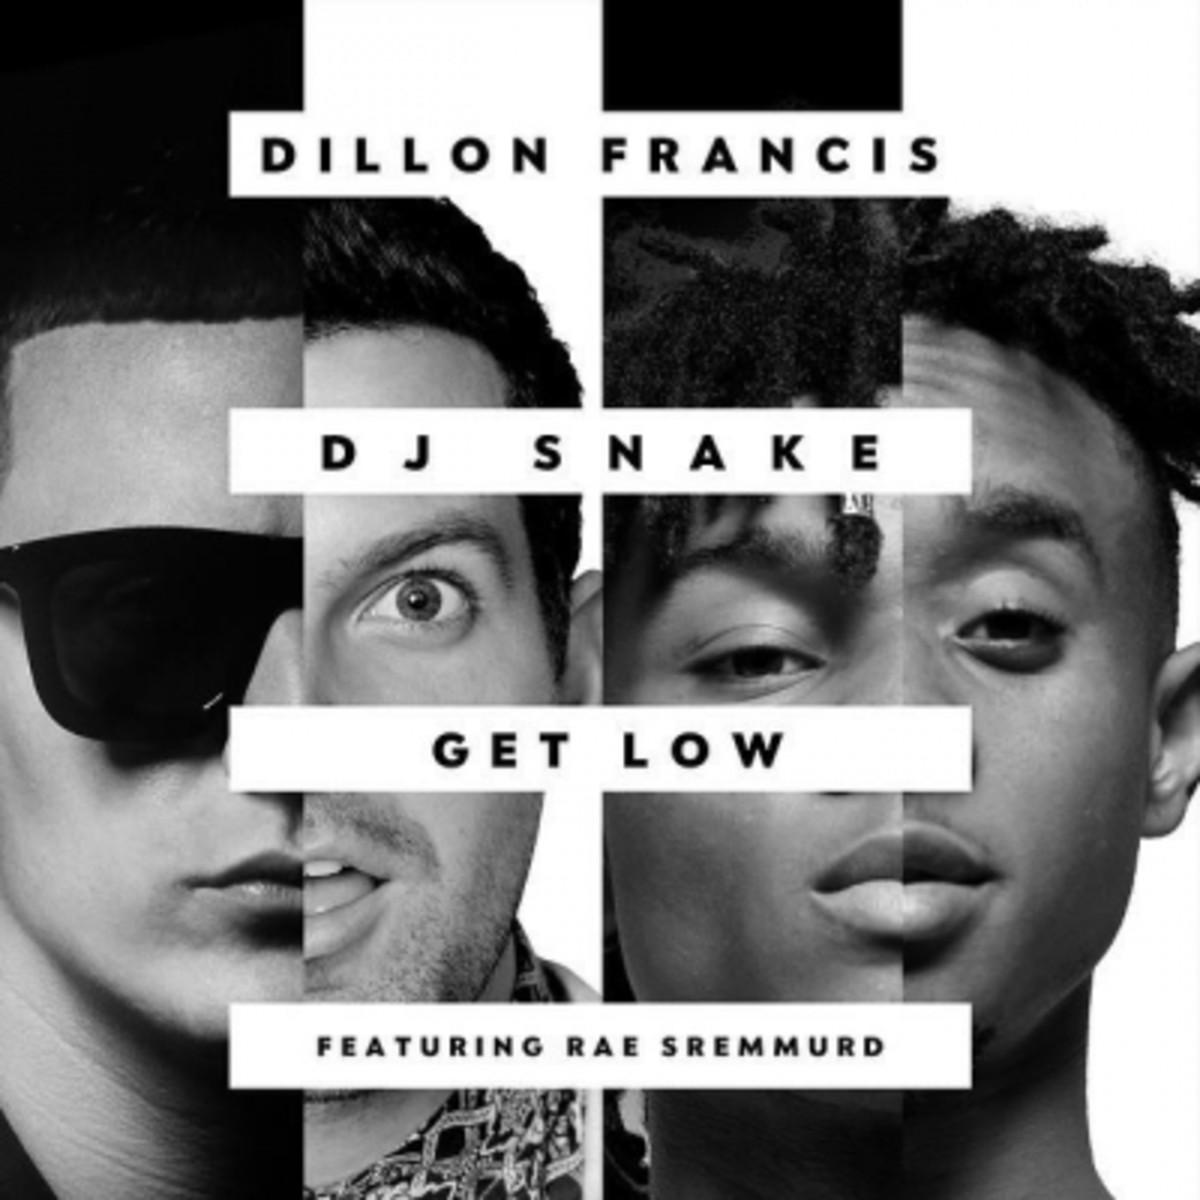 dillon-francis-dj-snake-get-low-remix.jpg